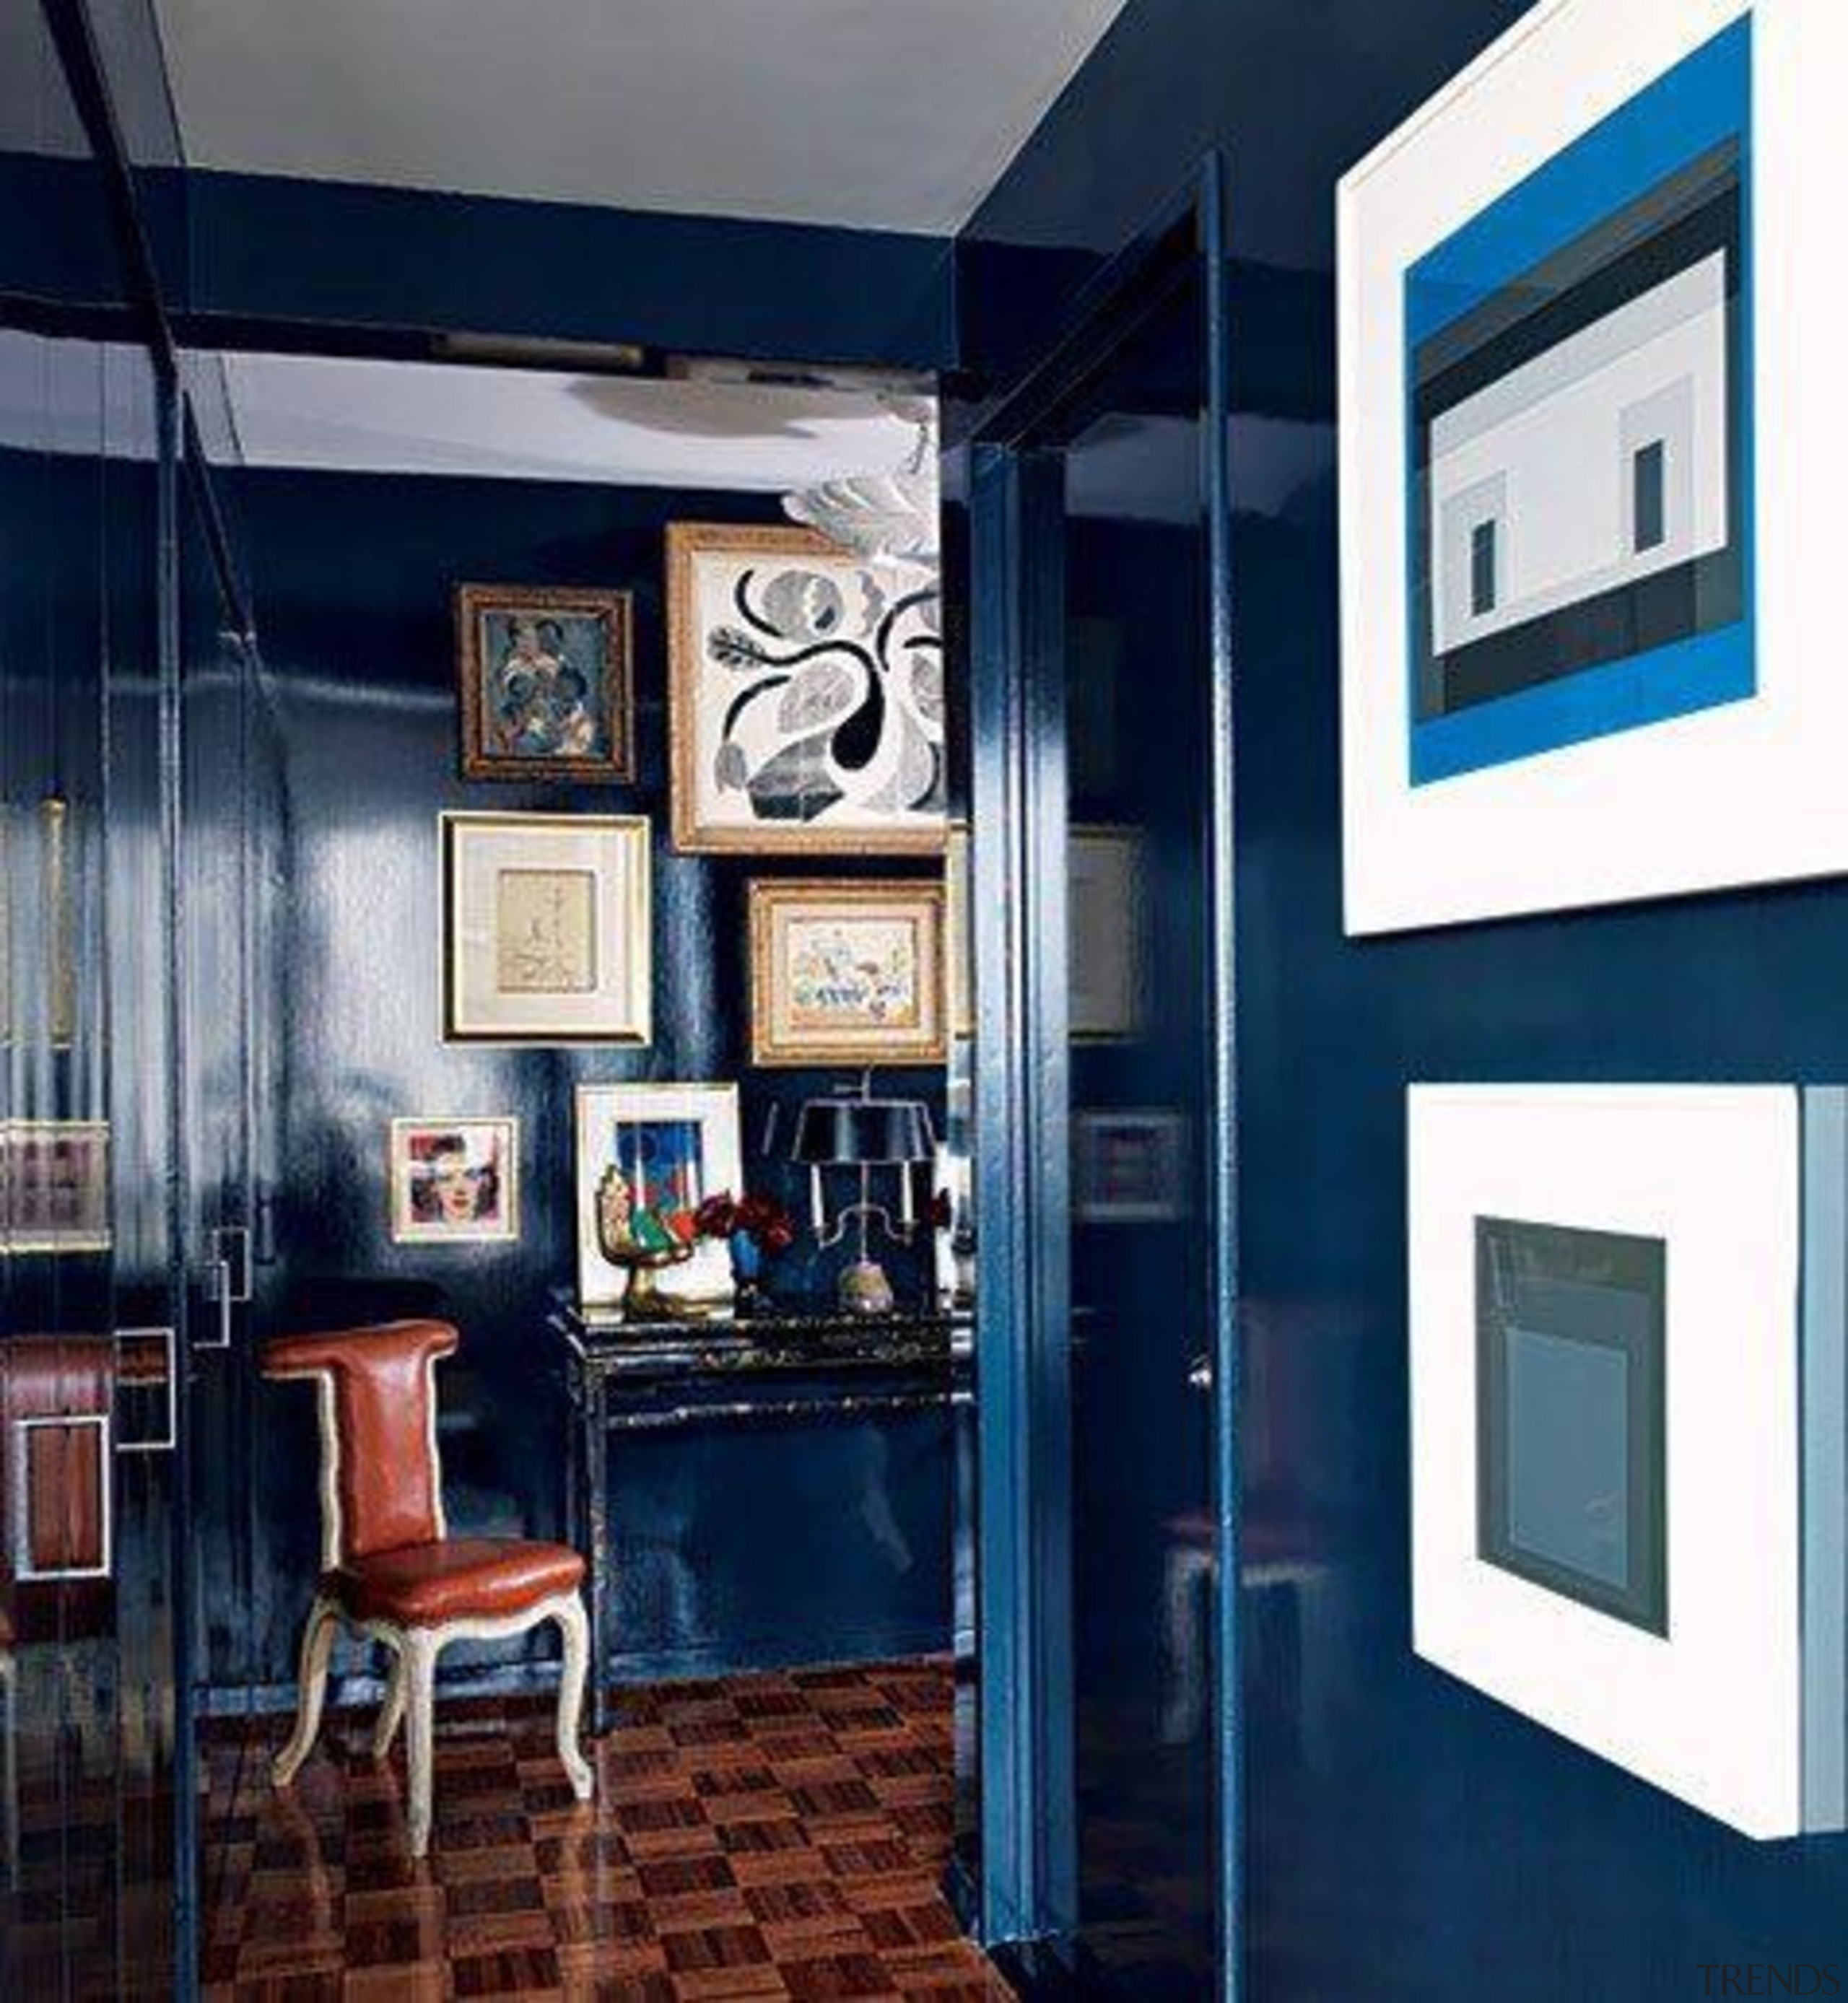 cerulean  elementsofstyleblogcom.jpg - cerulean__elementsofstyleblogcom.jpg - ceiling | ceiling, interior design, room, wall, blue